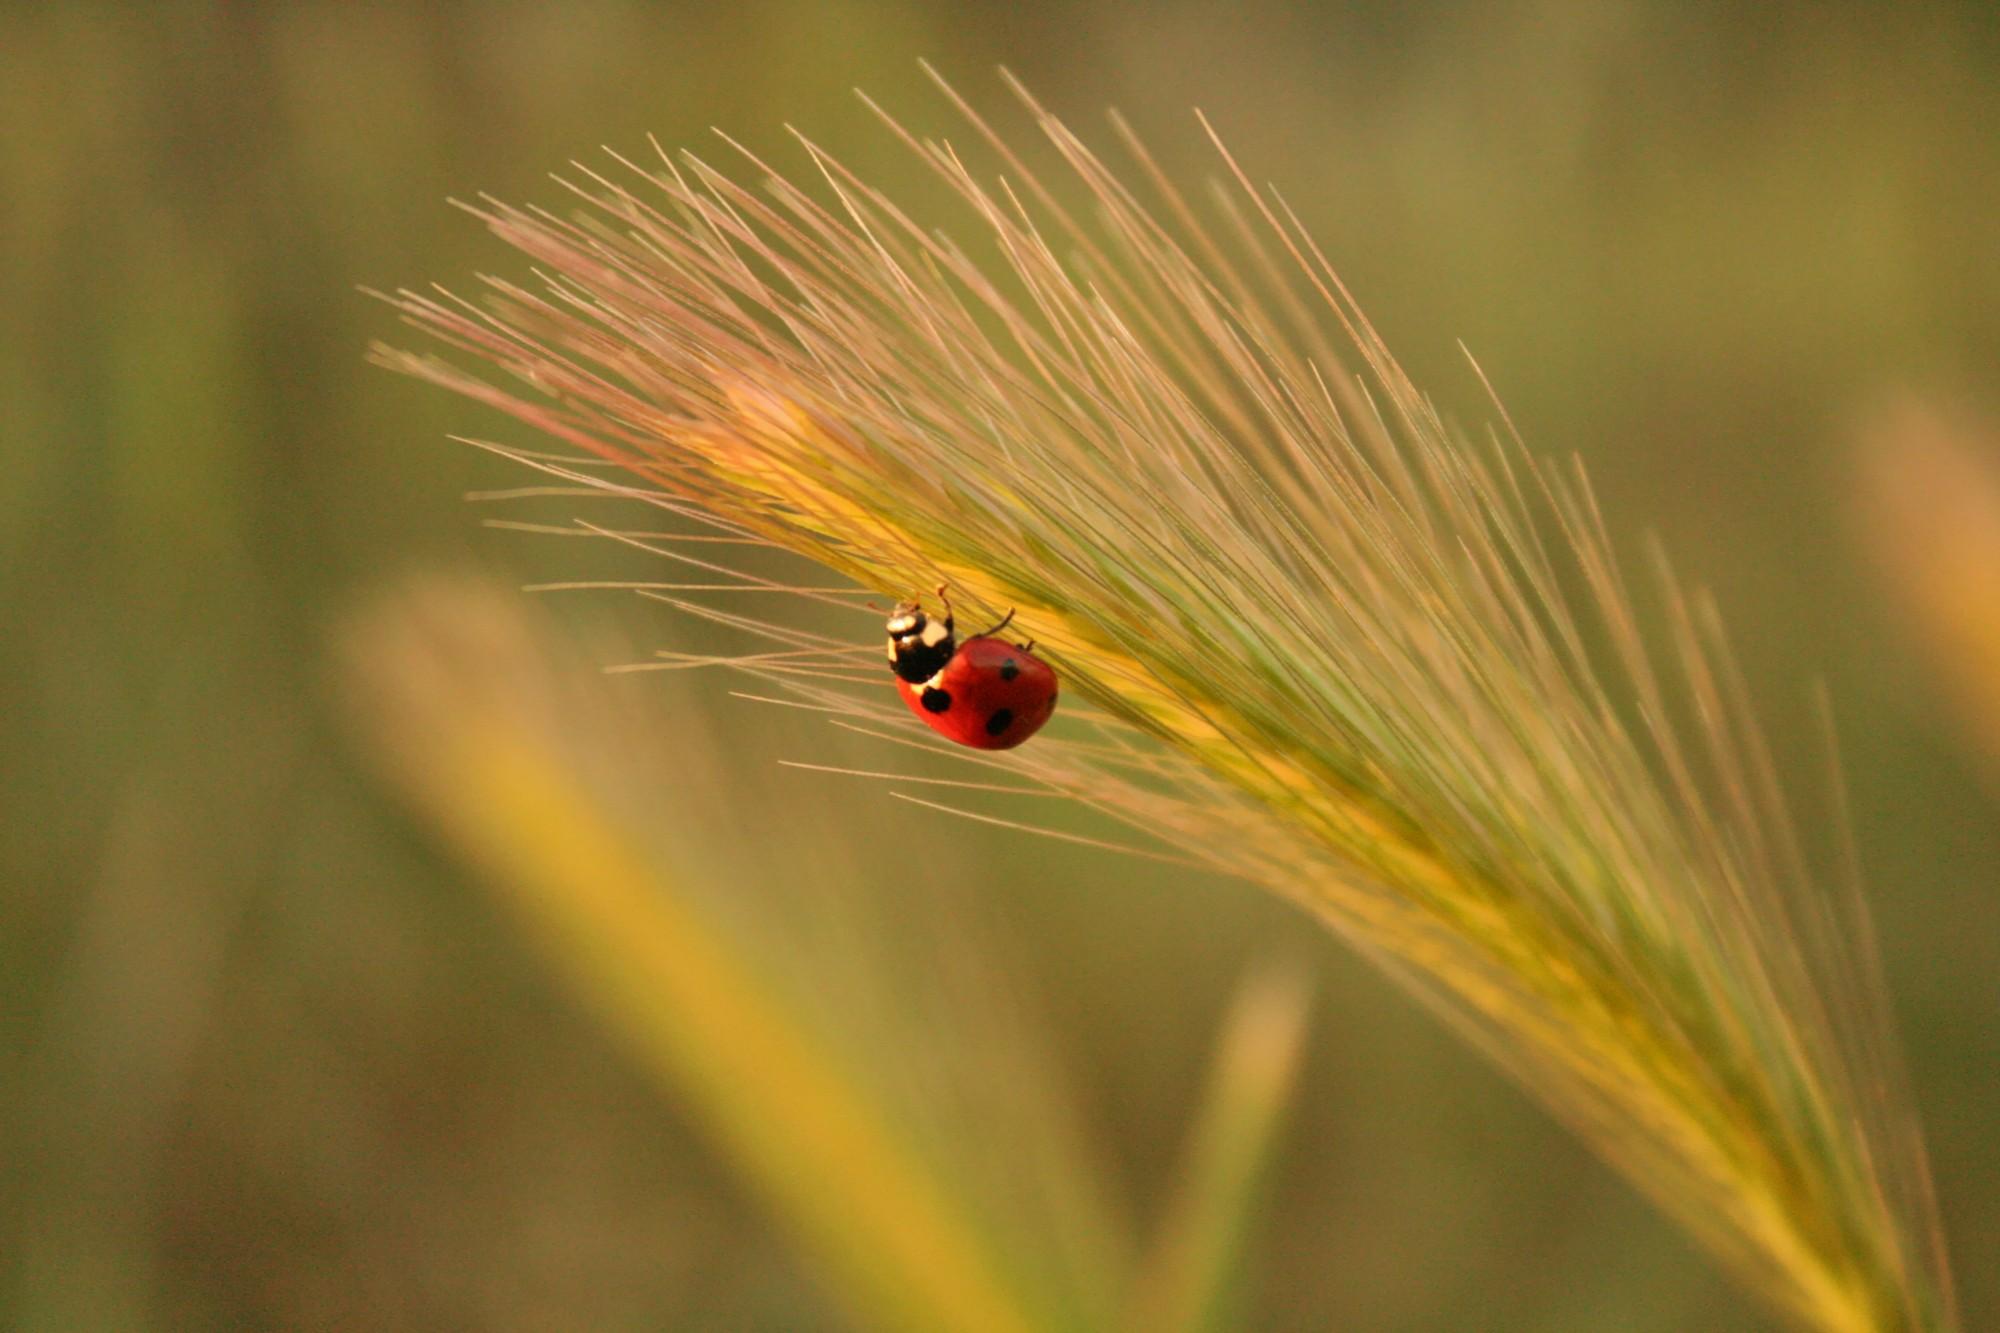 Ladybird climbing an ear with the light of the sunset